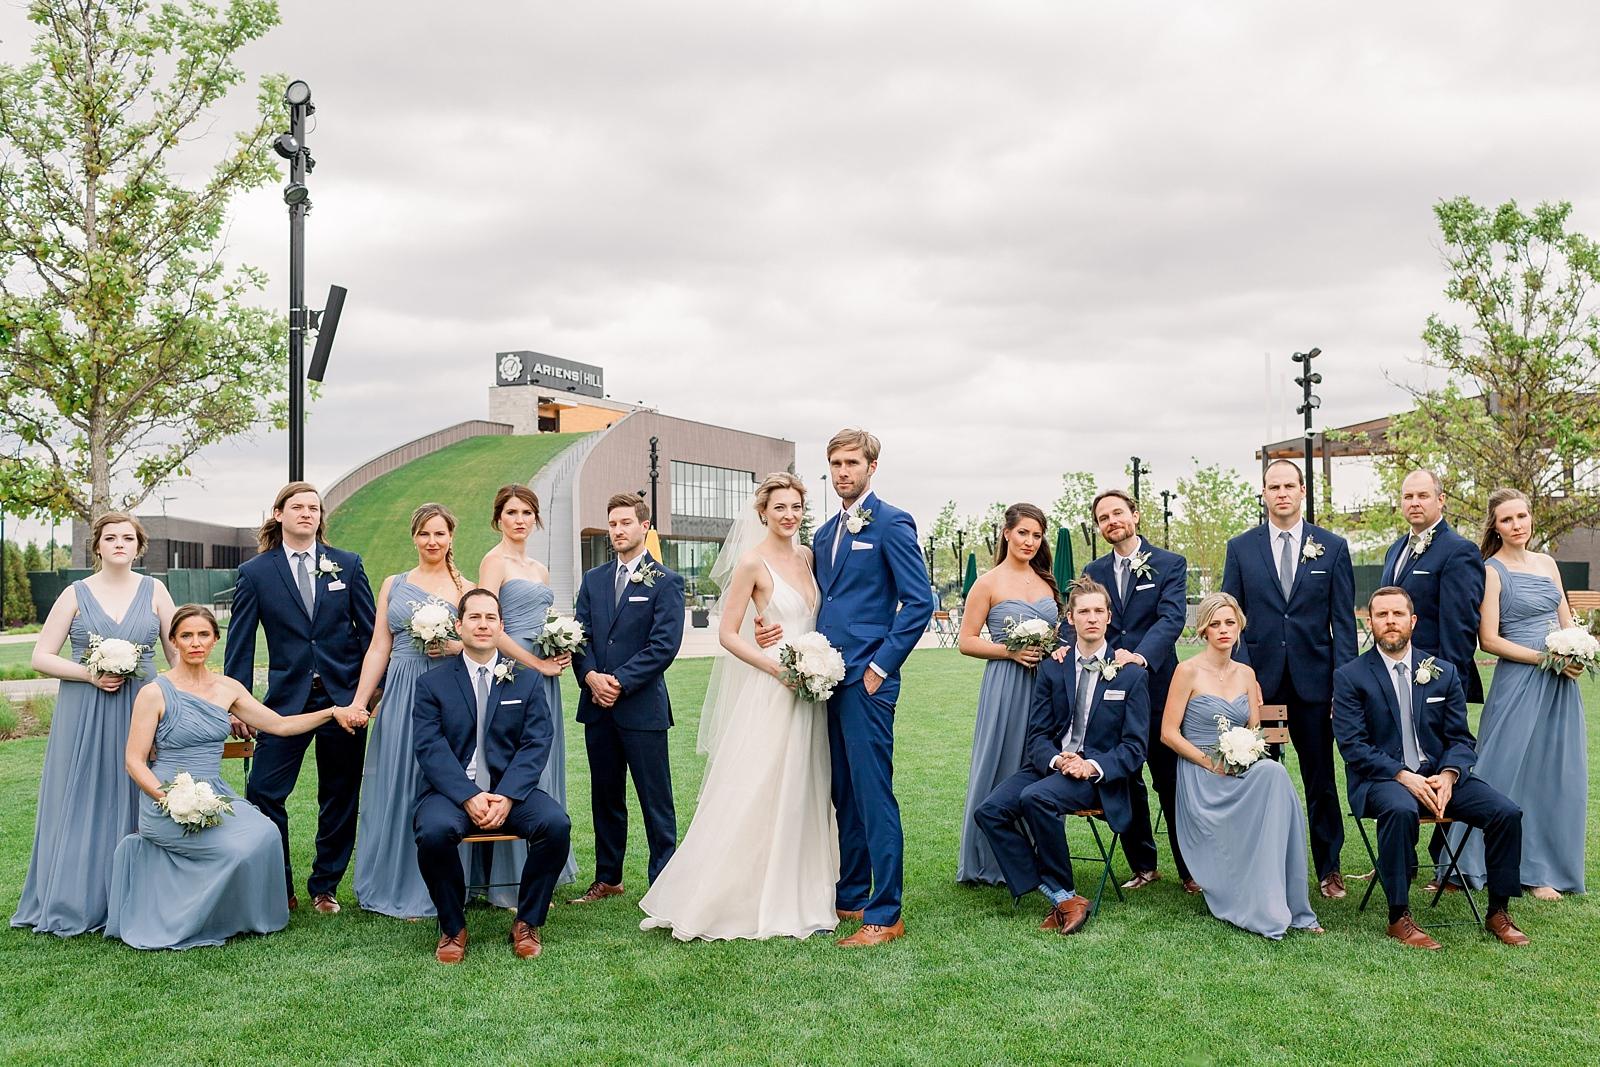 Hinterland-Brewery-Modern-Wedding-Kase-Styles-101.jpg